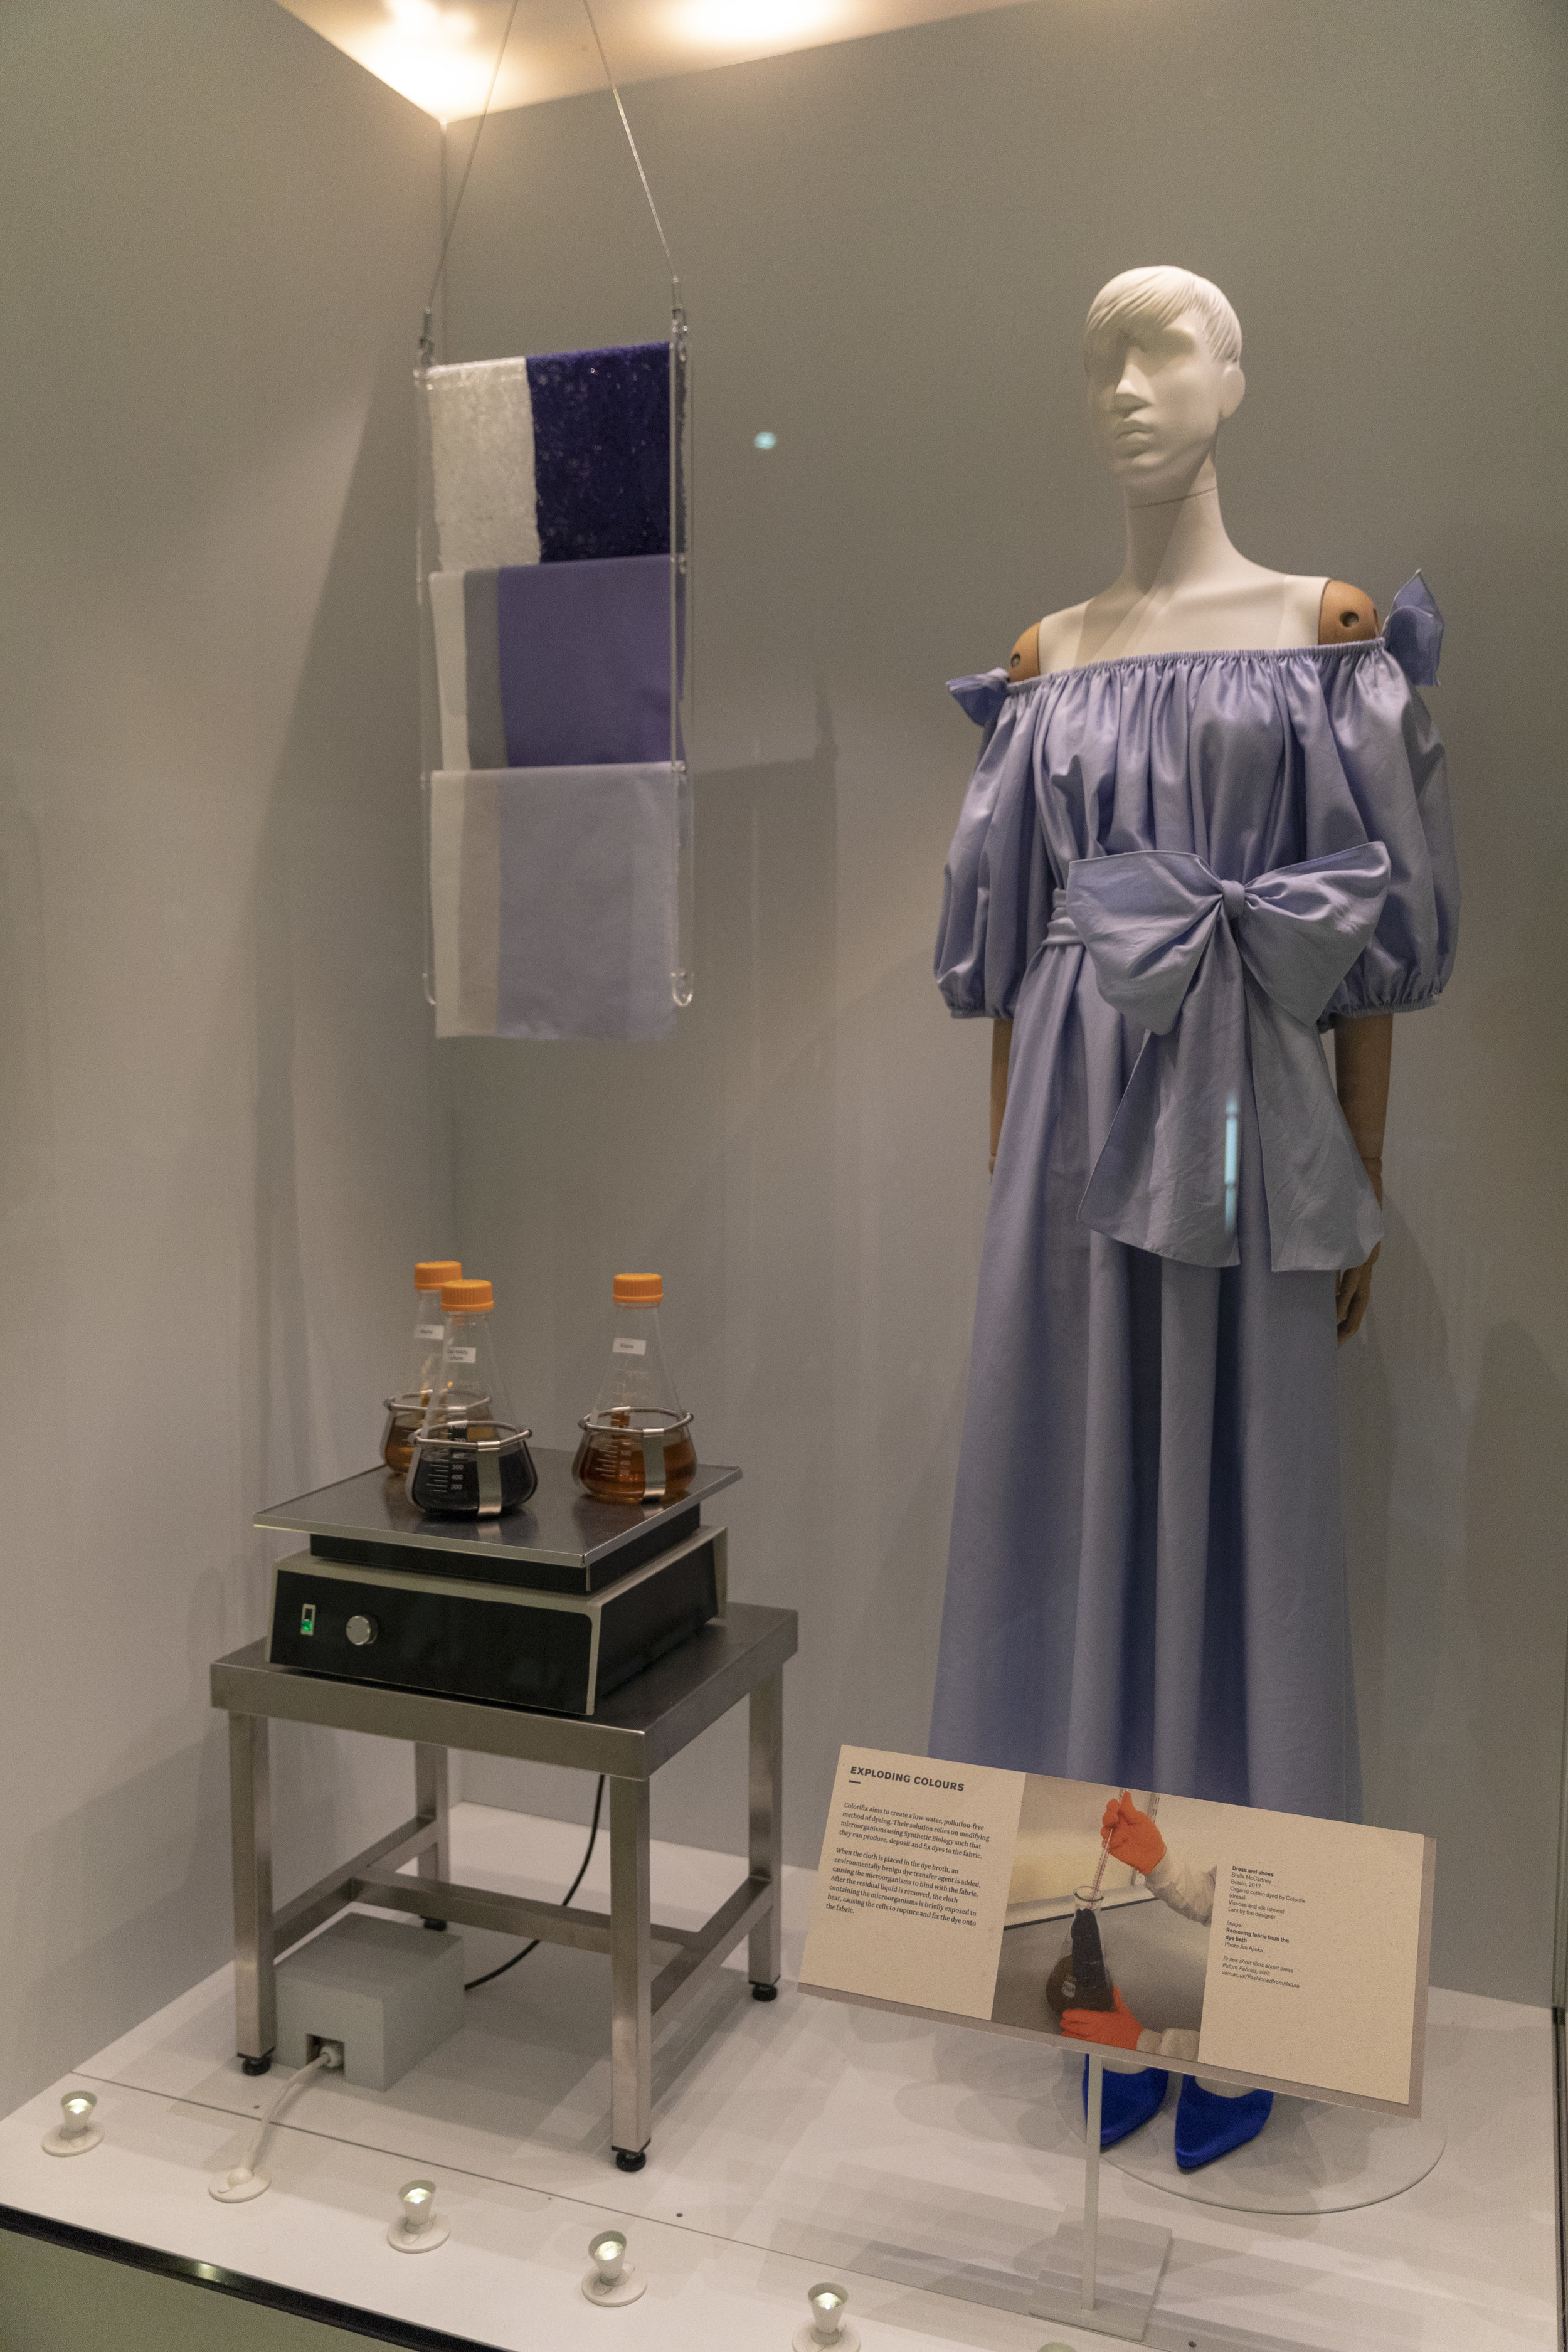 V&A Museum_Edwina Erhnam - Designer Stella McCartney035.jpg